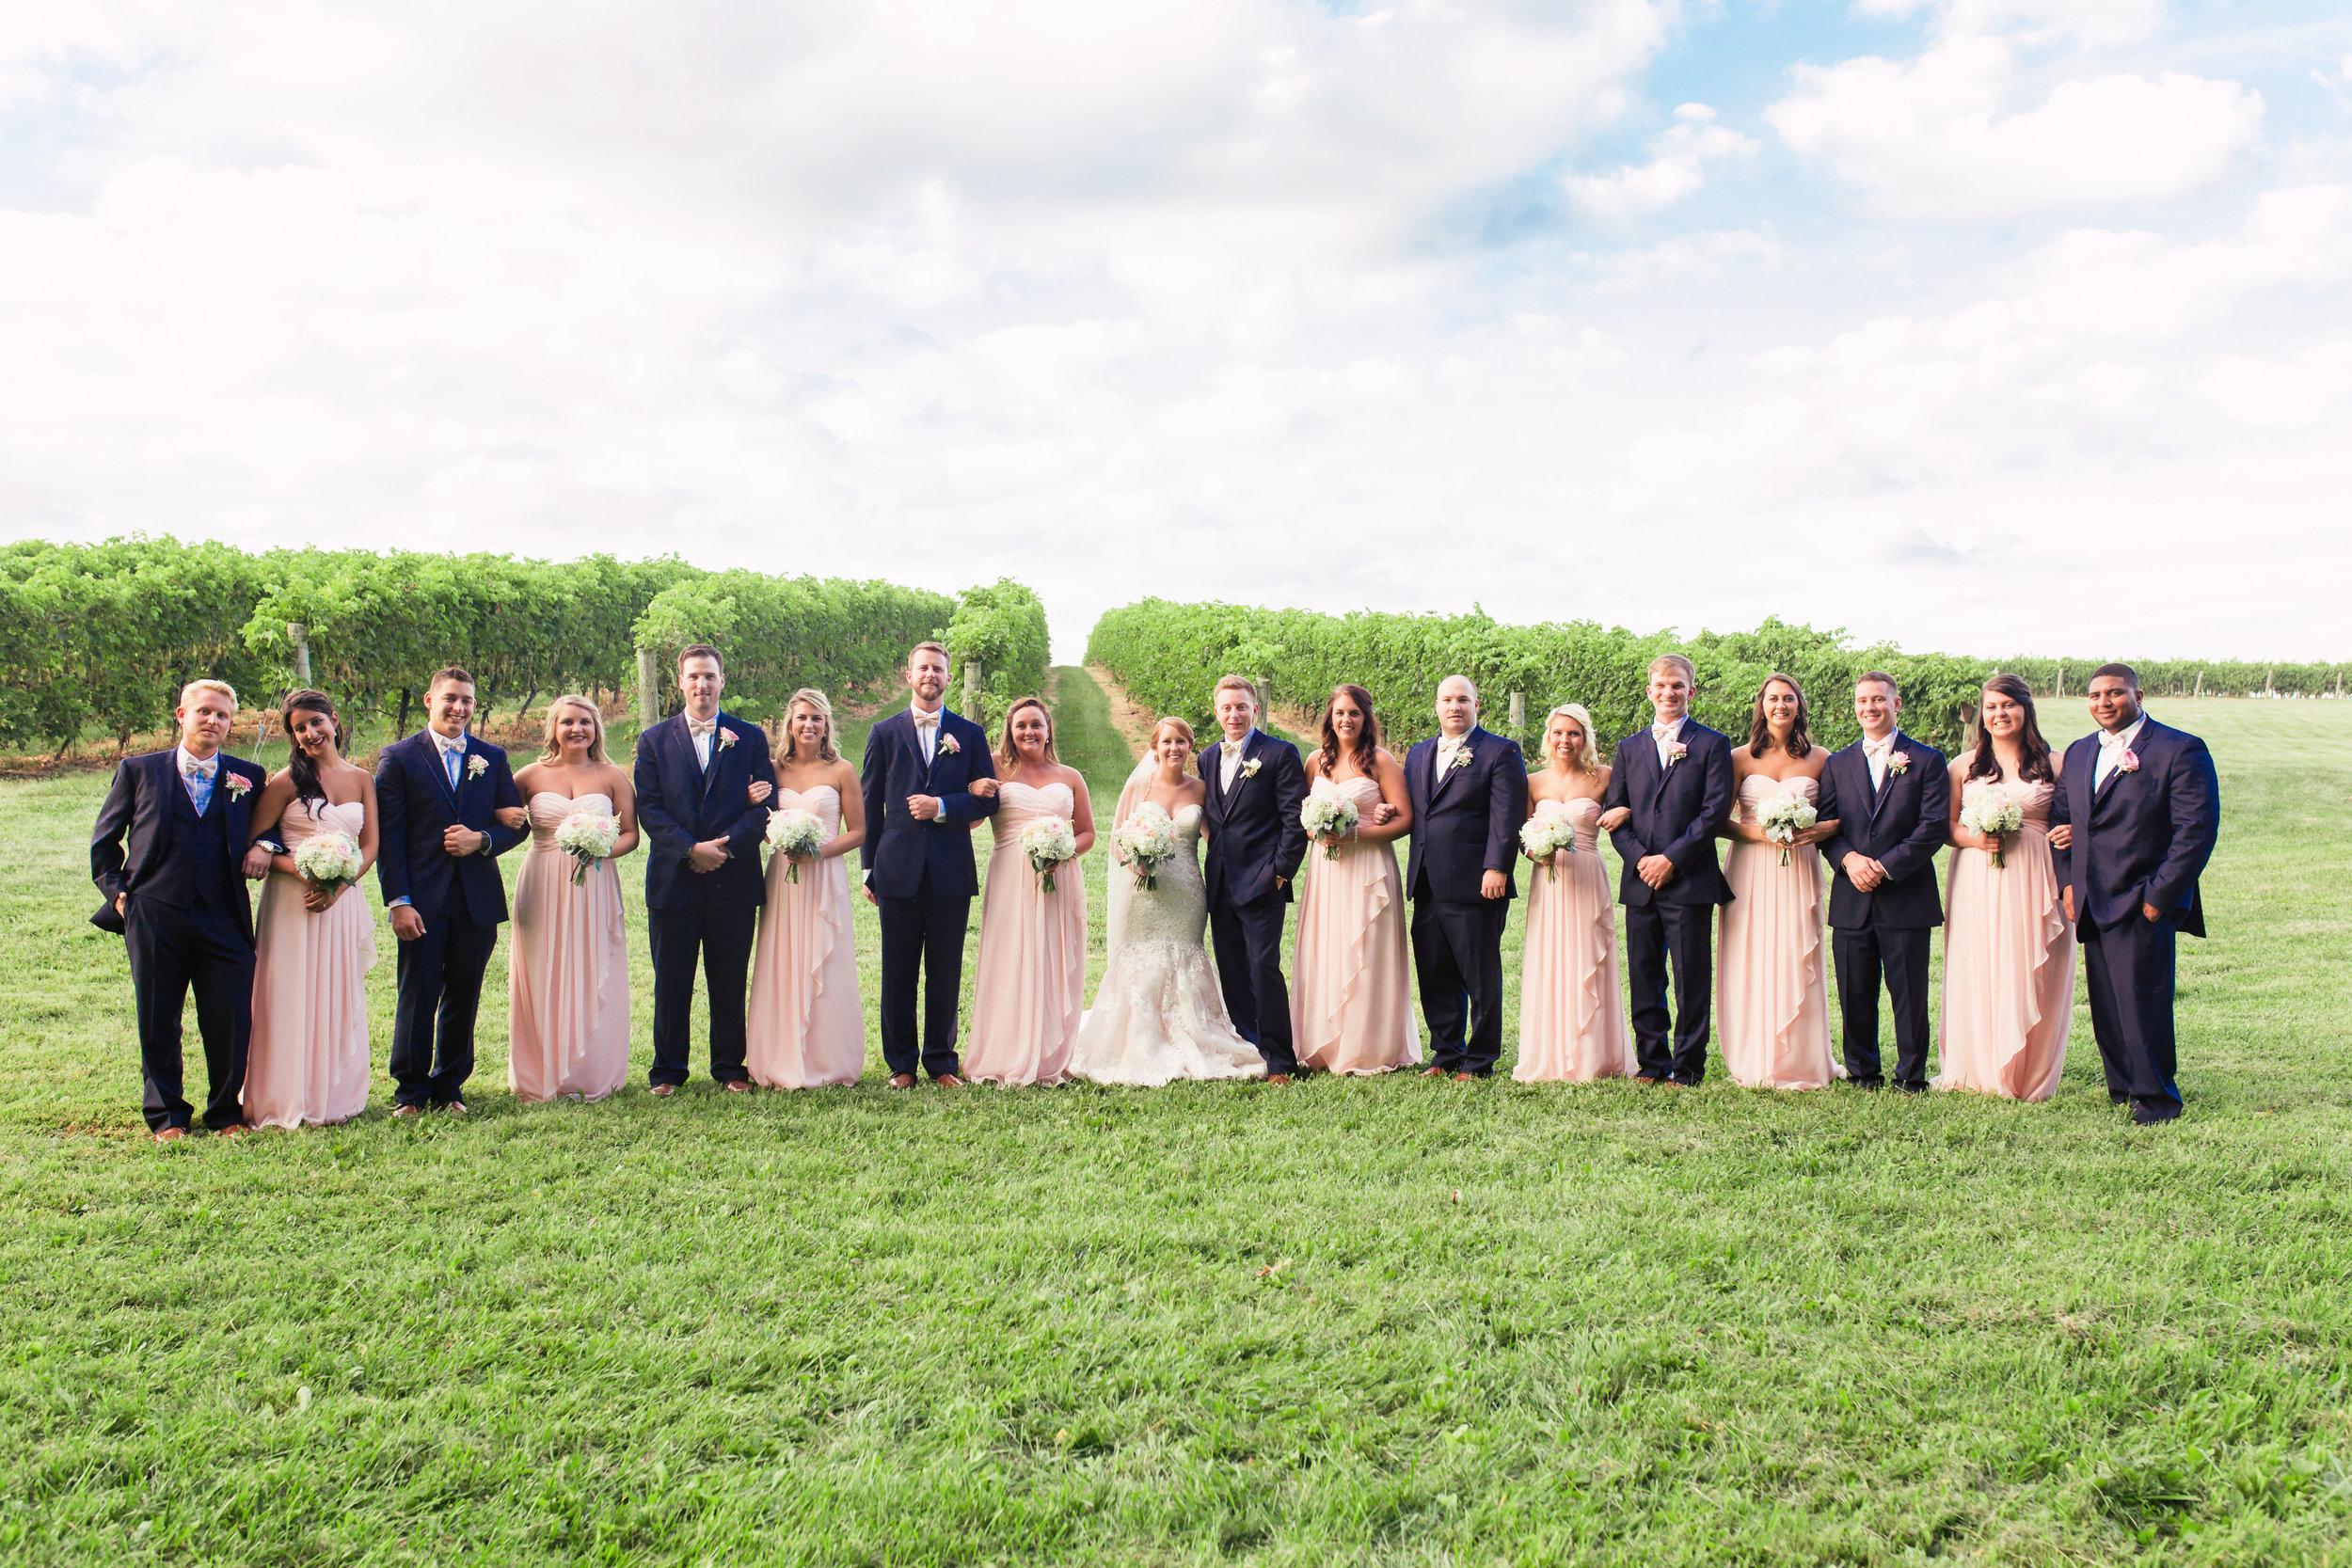 wedding party5.jpg